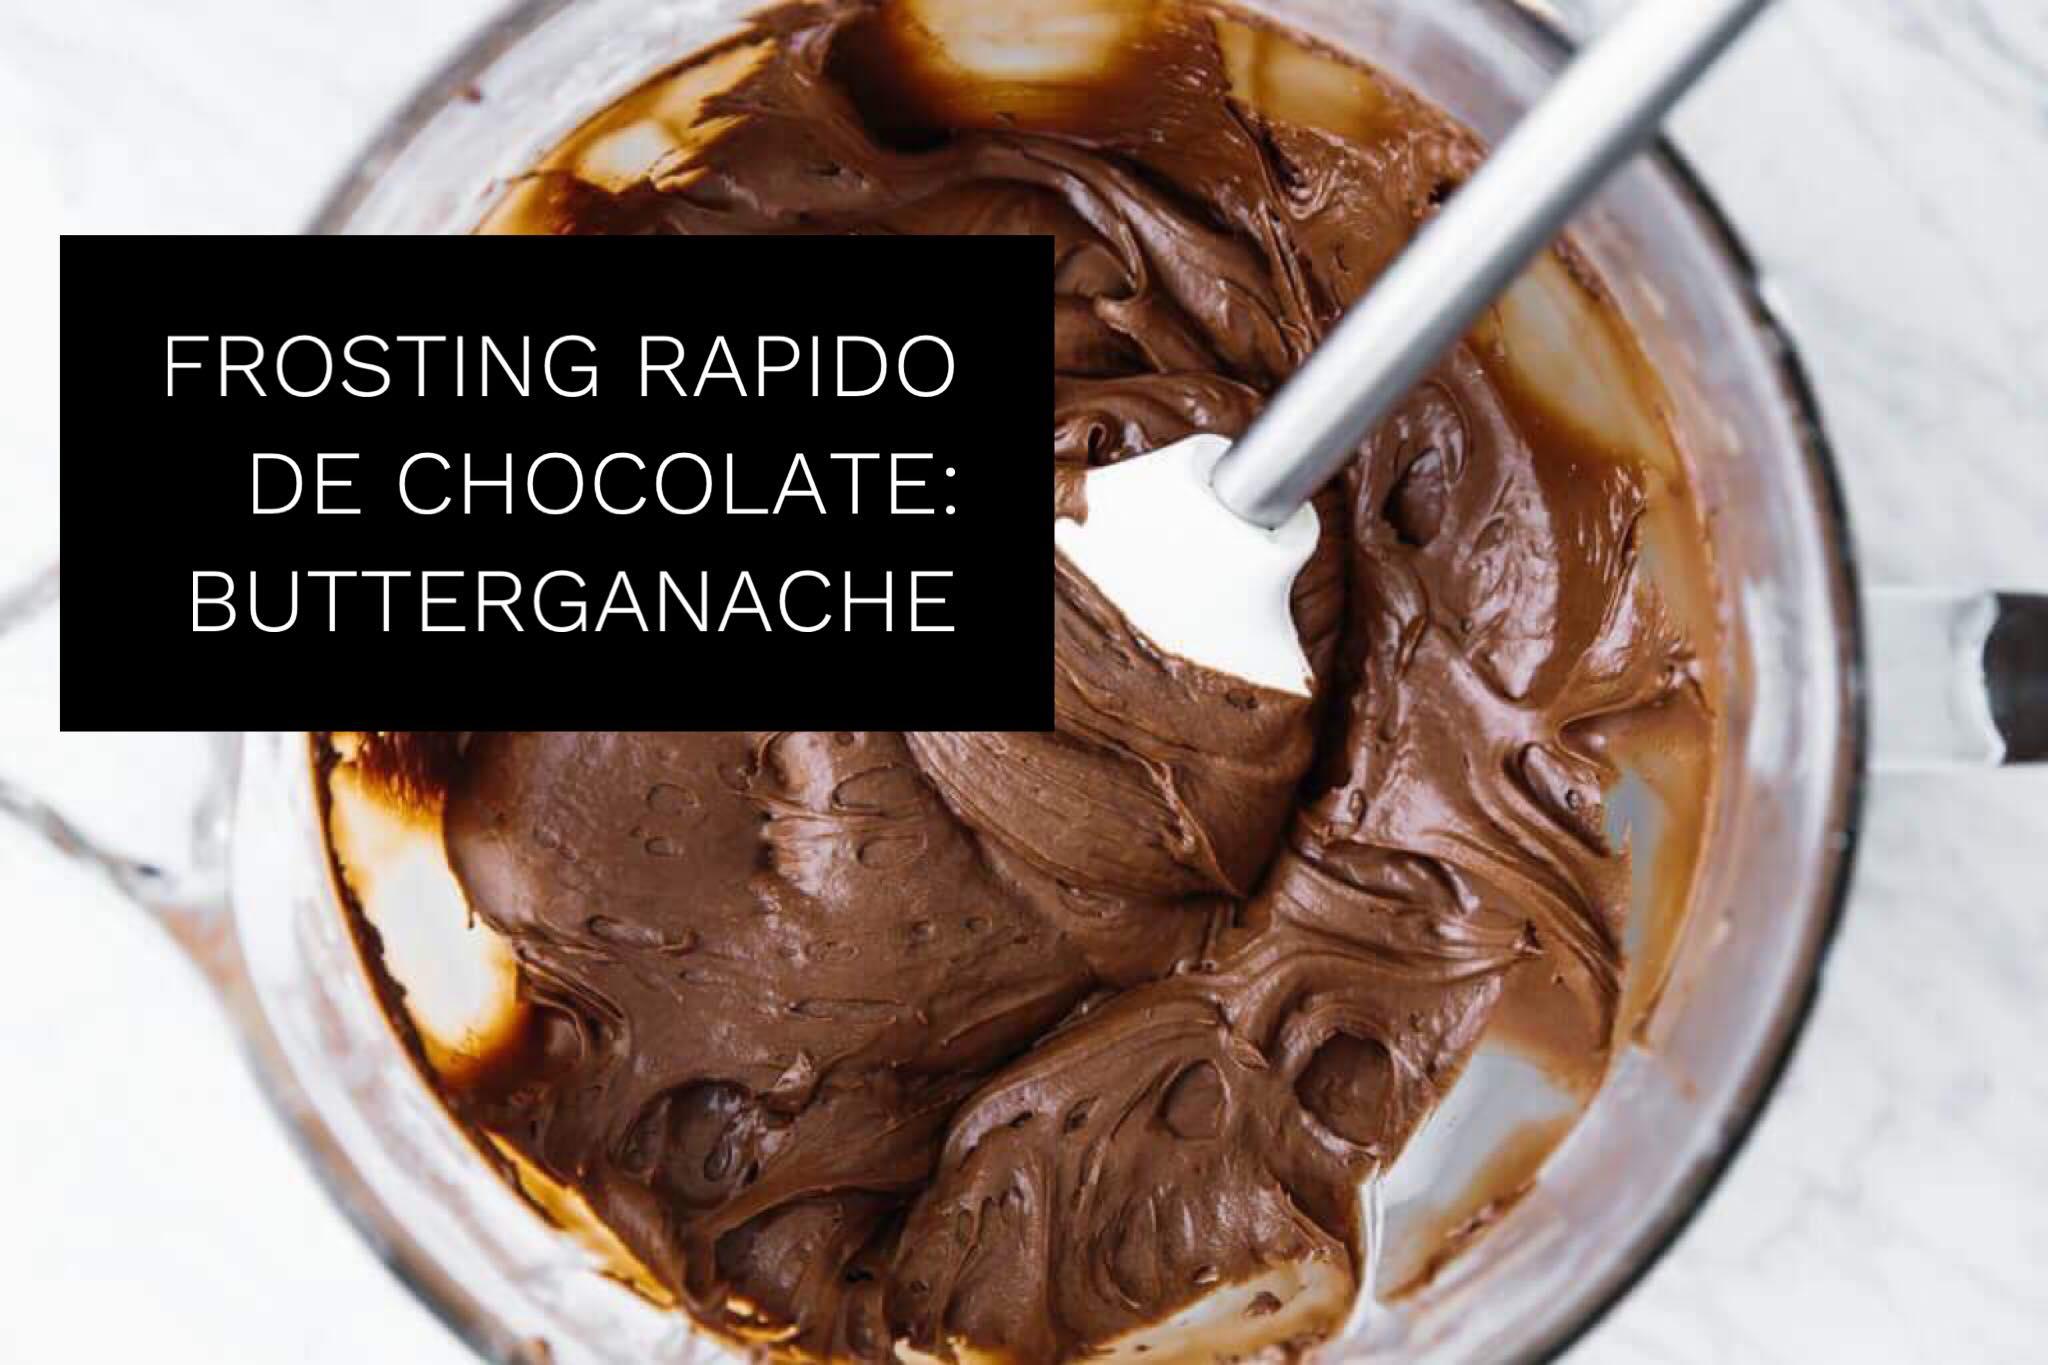 FROSTING DE CHOCOLATE RÁPIDO O BUTTERGANACHE